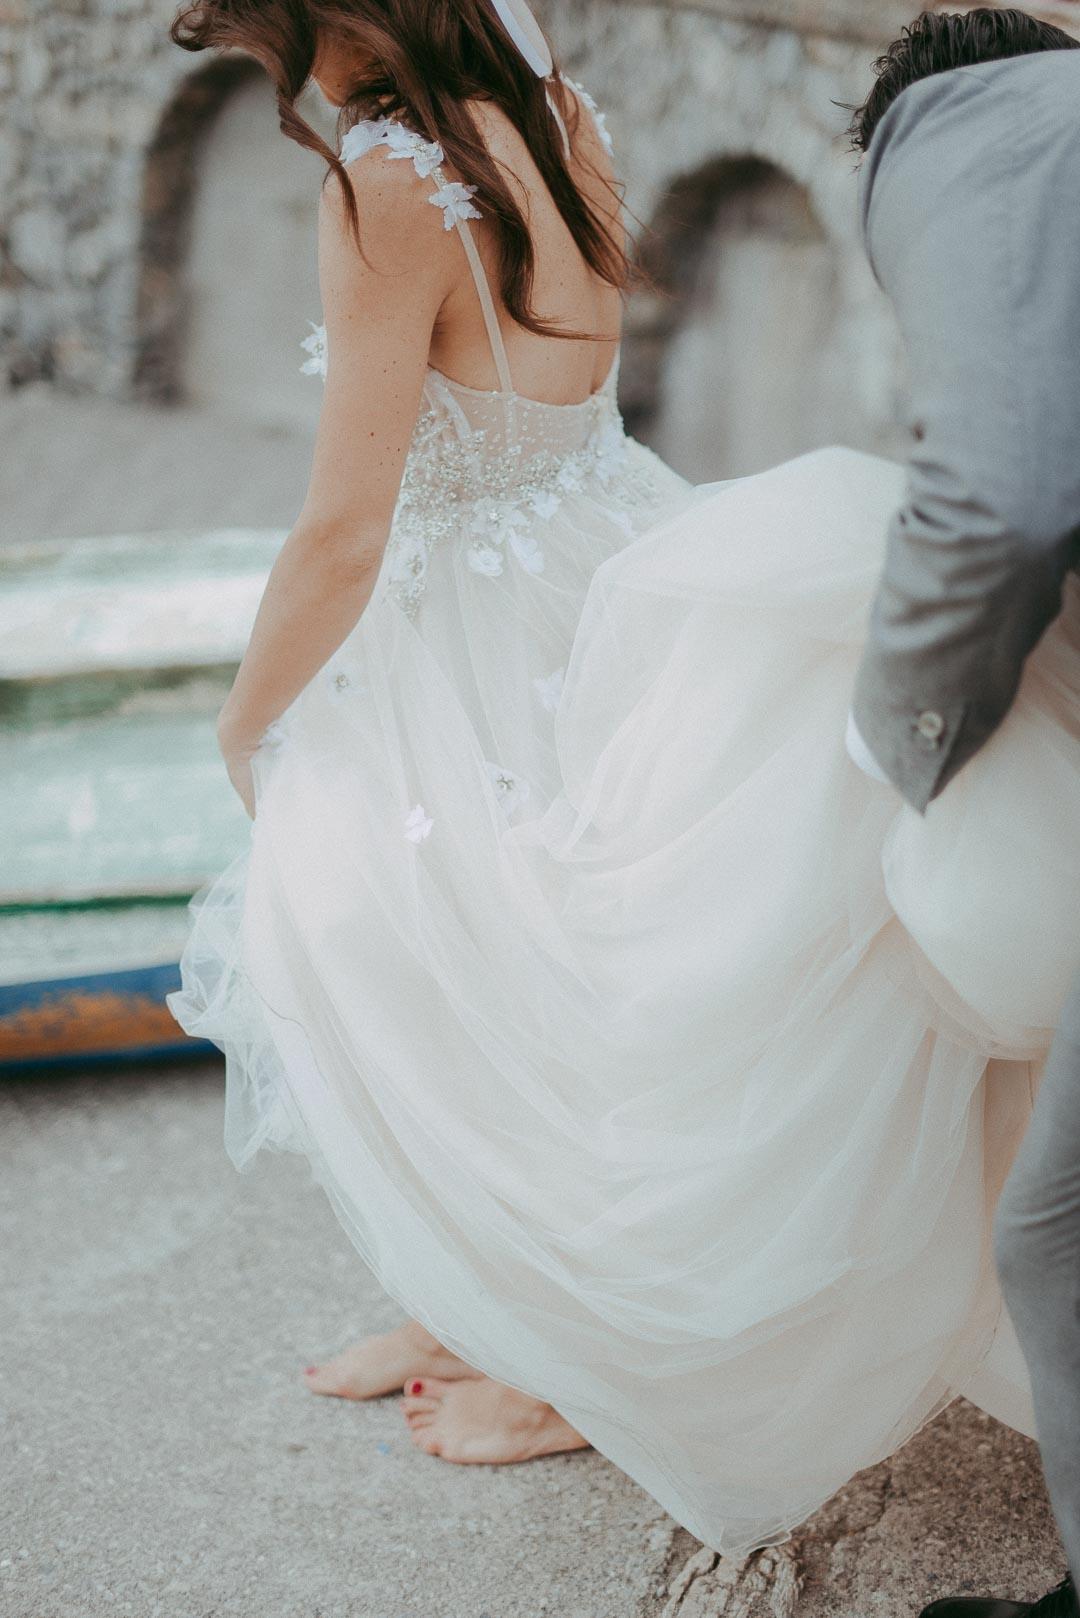 wedding-photographer-destination-fineart-bespoke-reportage-amalficoast-torrelacerniola-vivianeizzo-spazio46-70